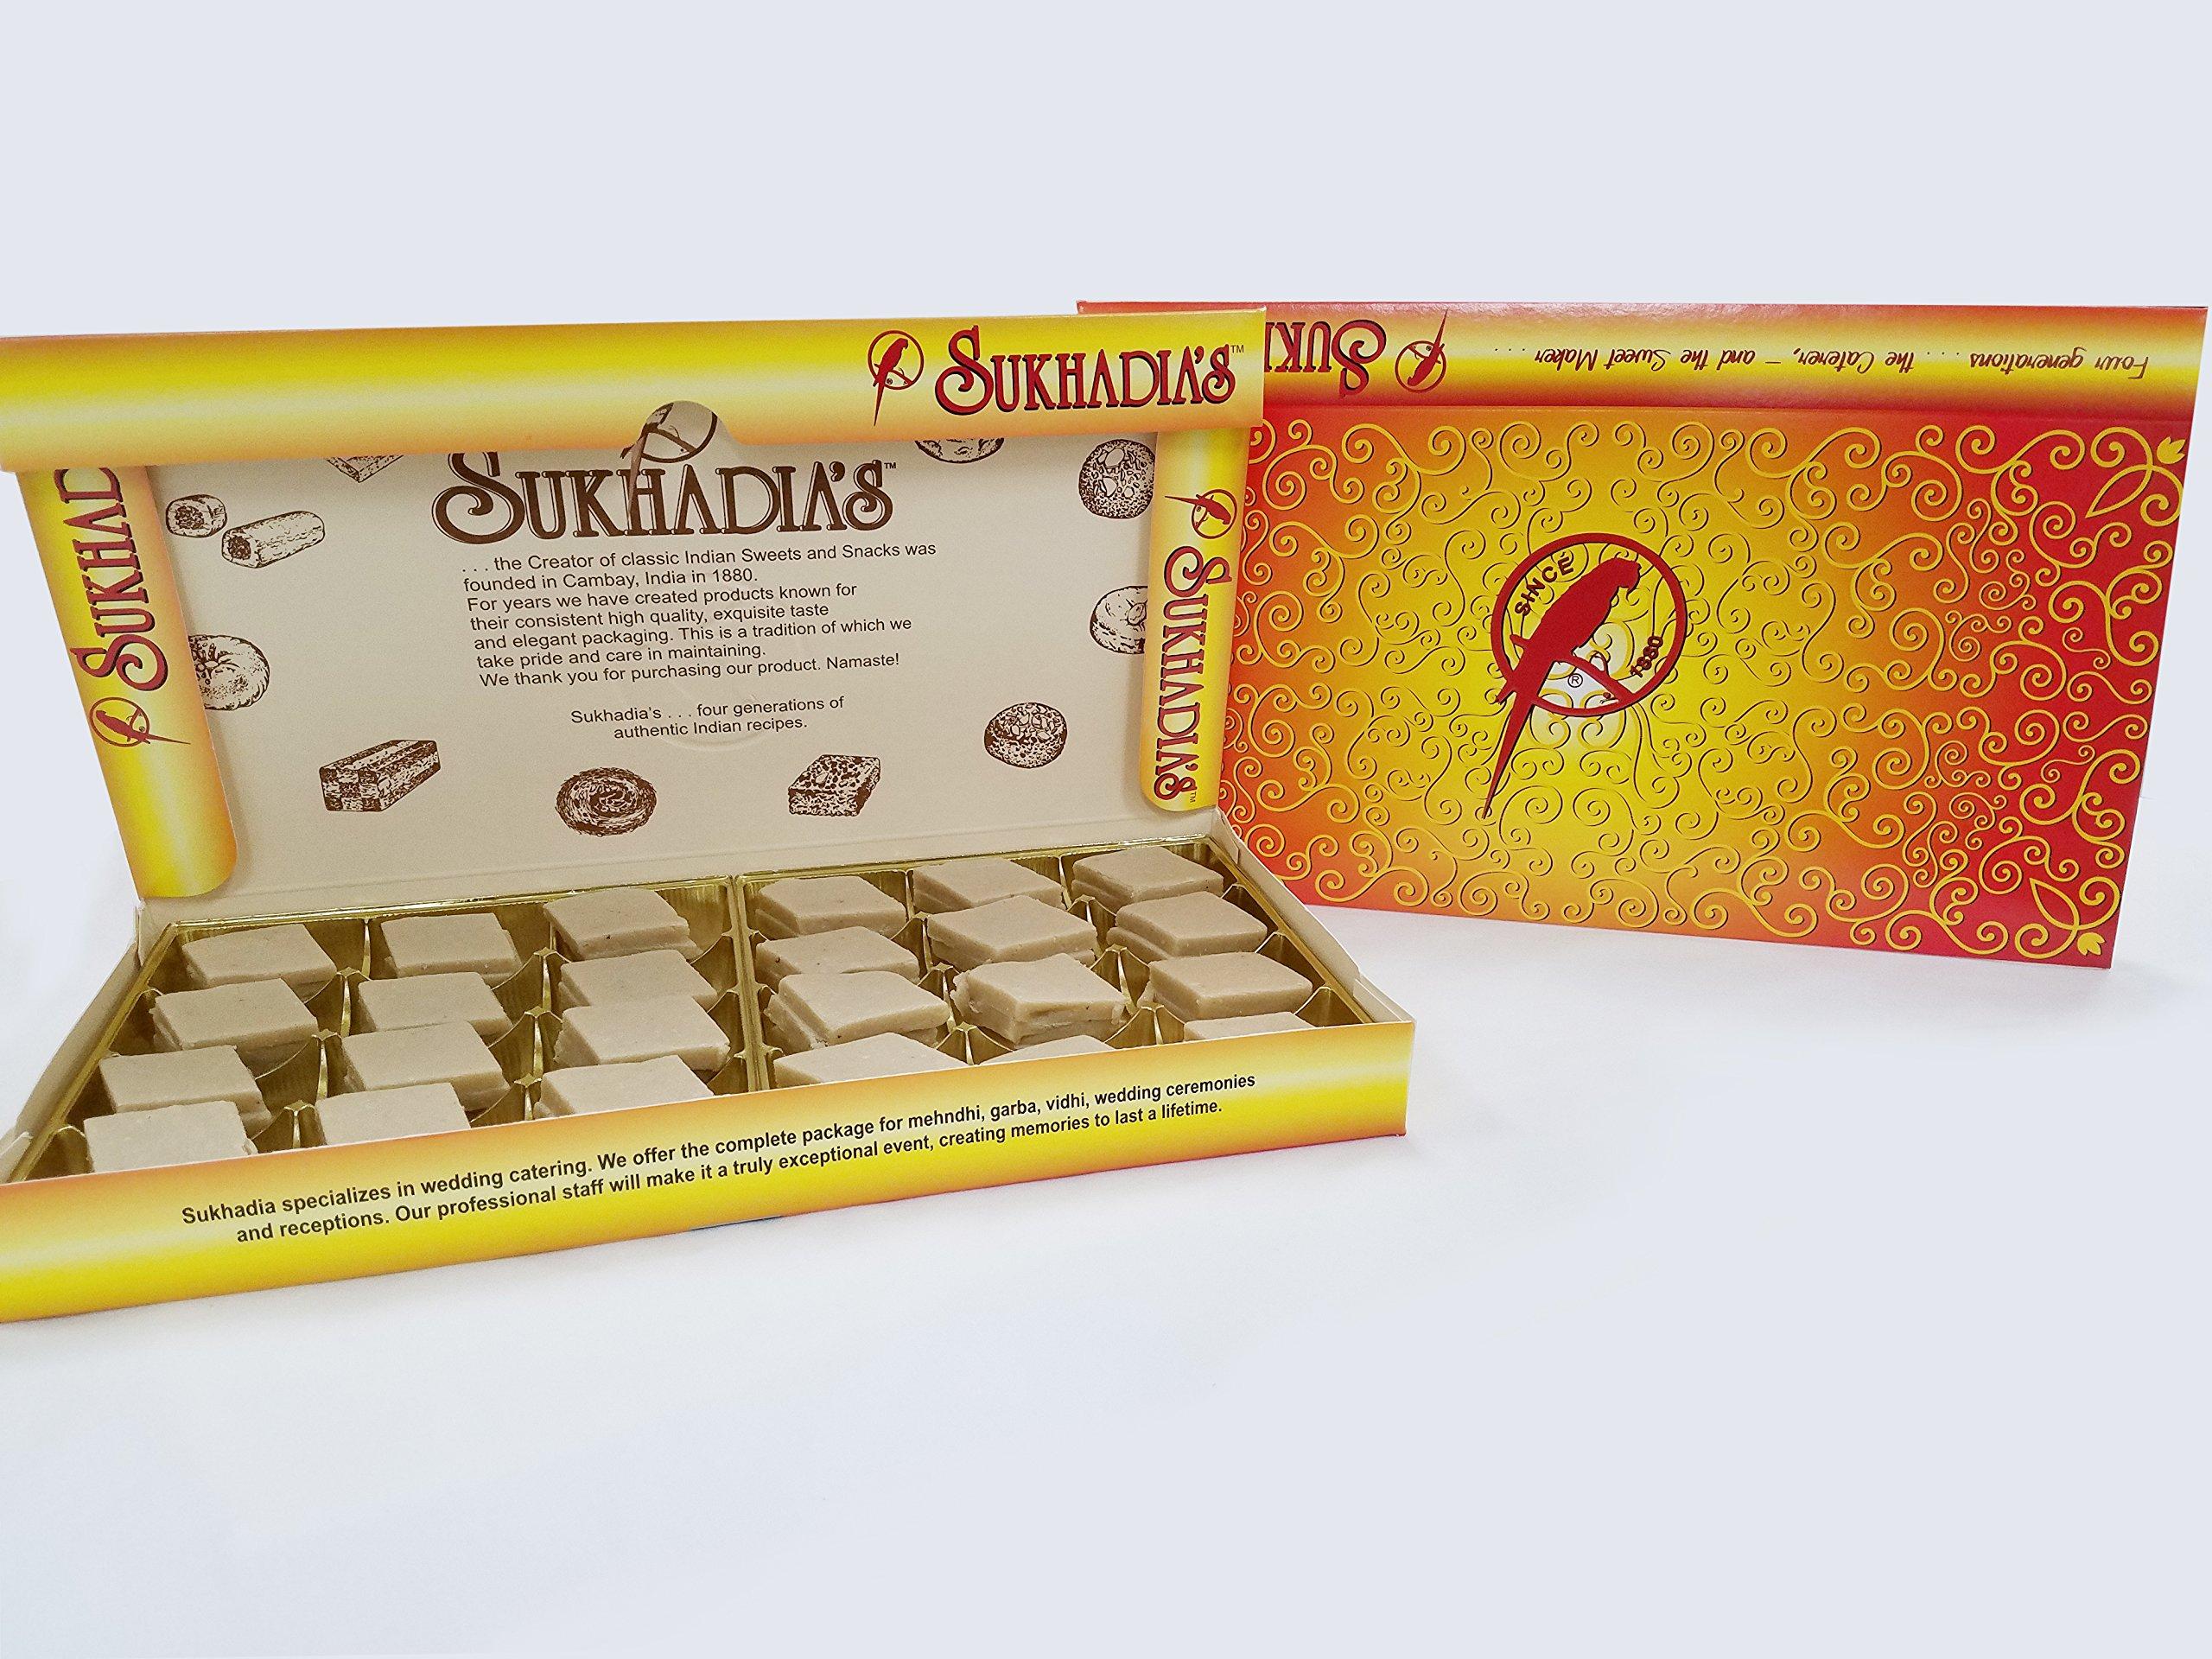 Sukhadia's Kaju Katli, Indian Sweet, 2LB Box (32oz)